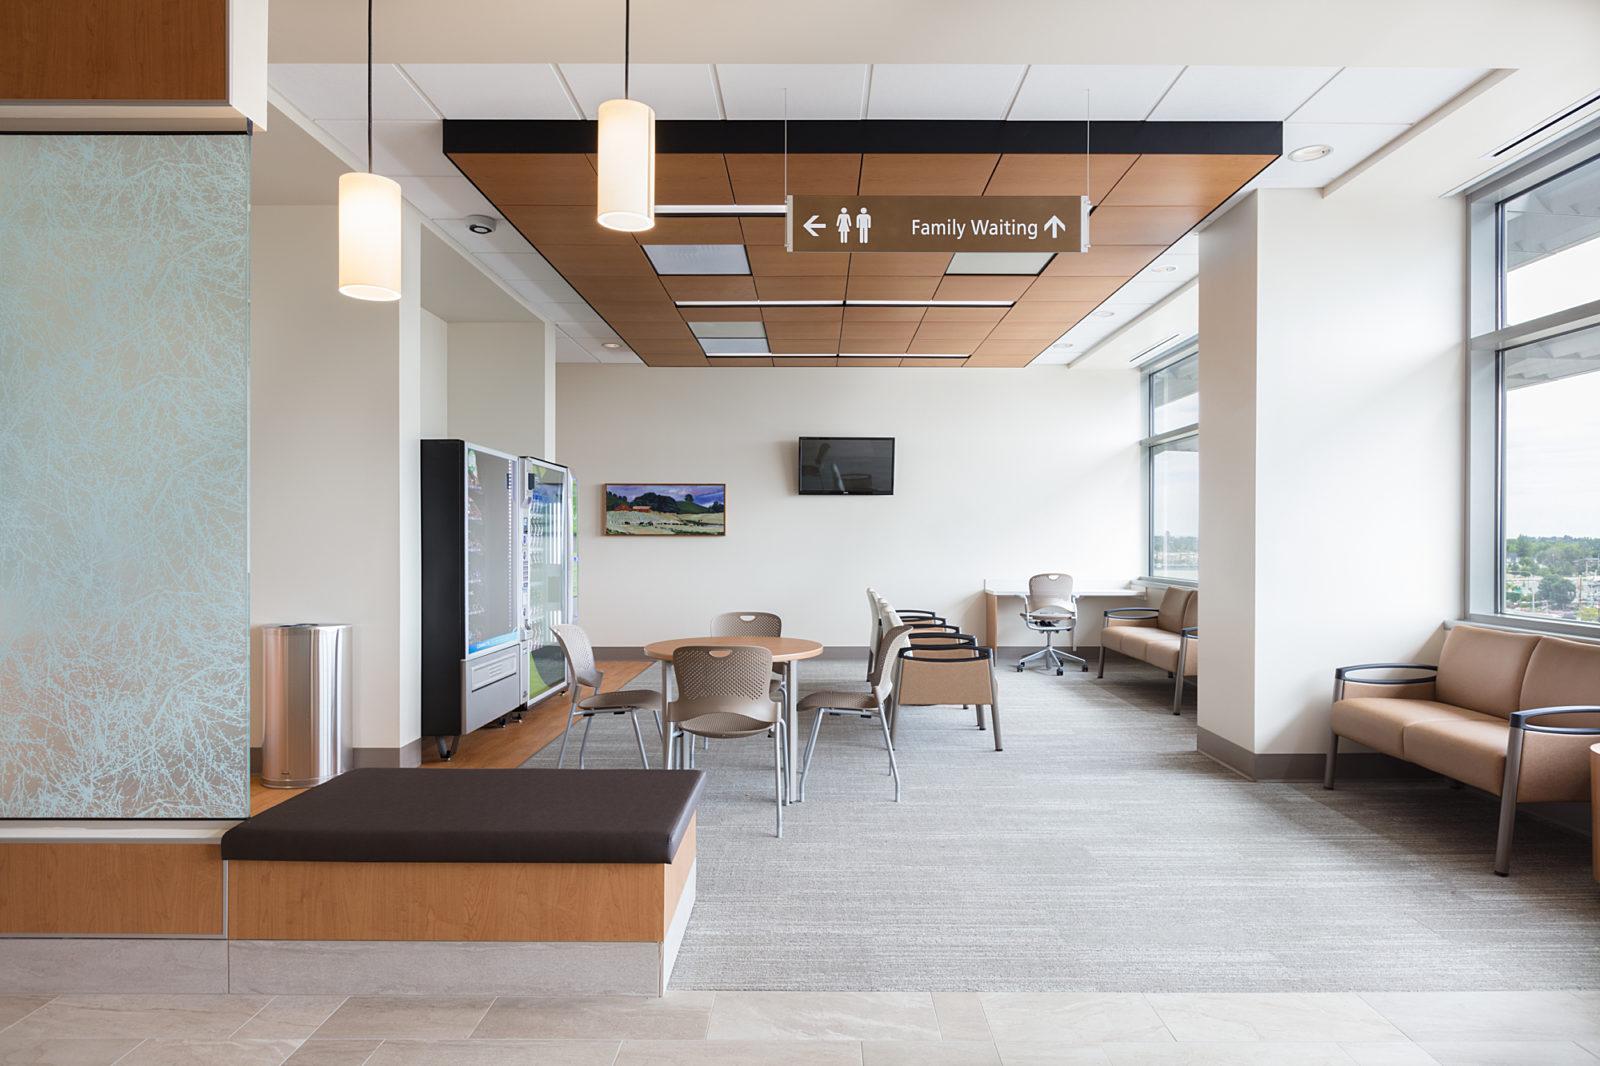 Saint Al Hospital Lounge